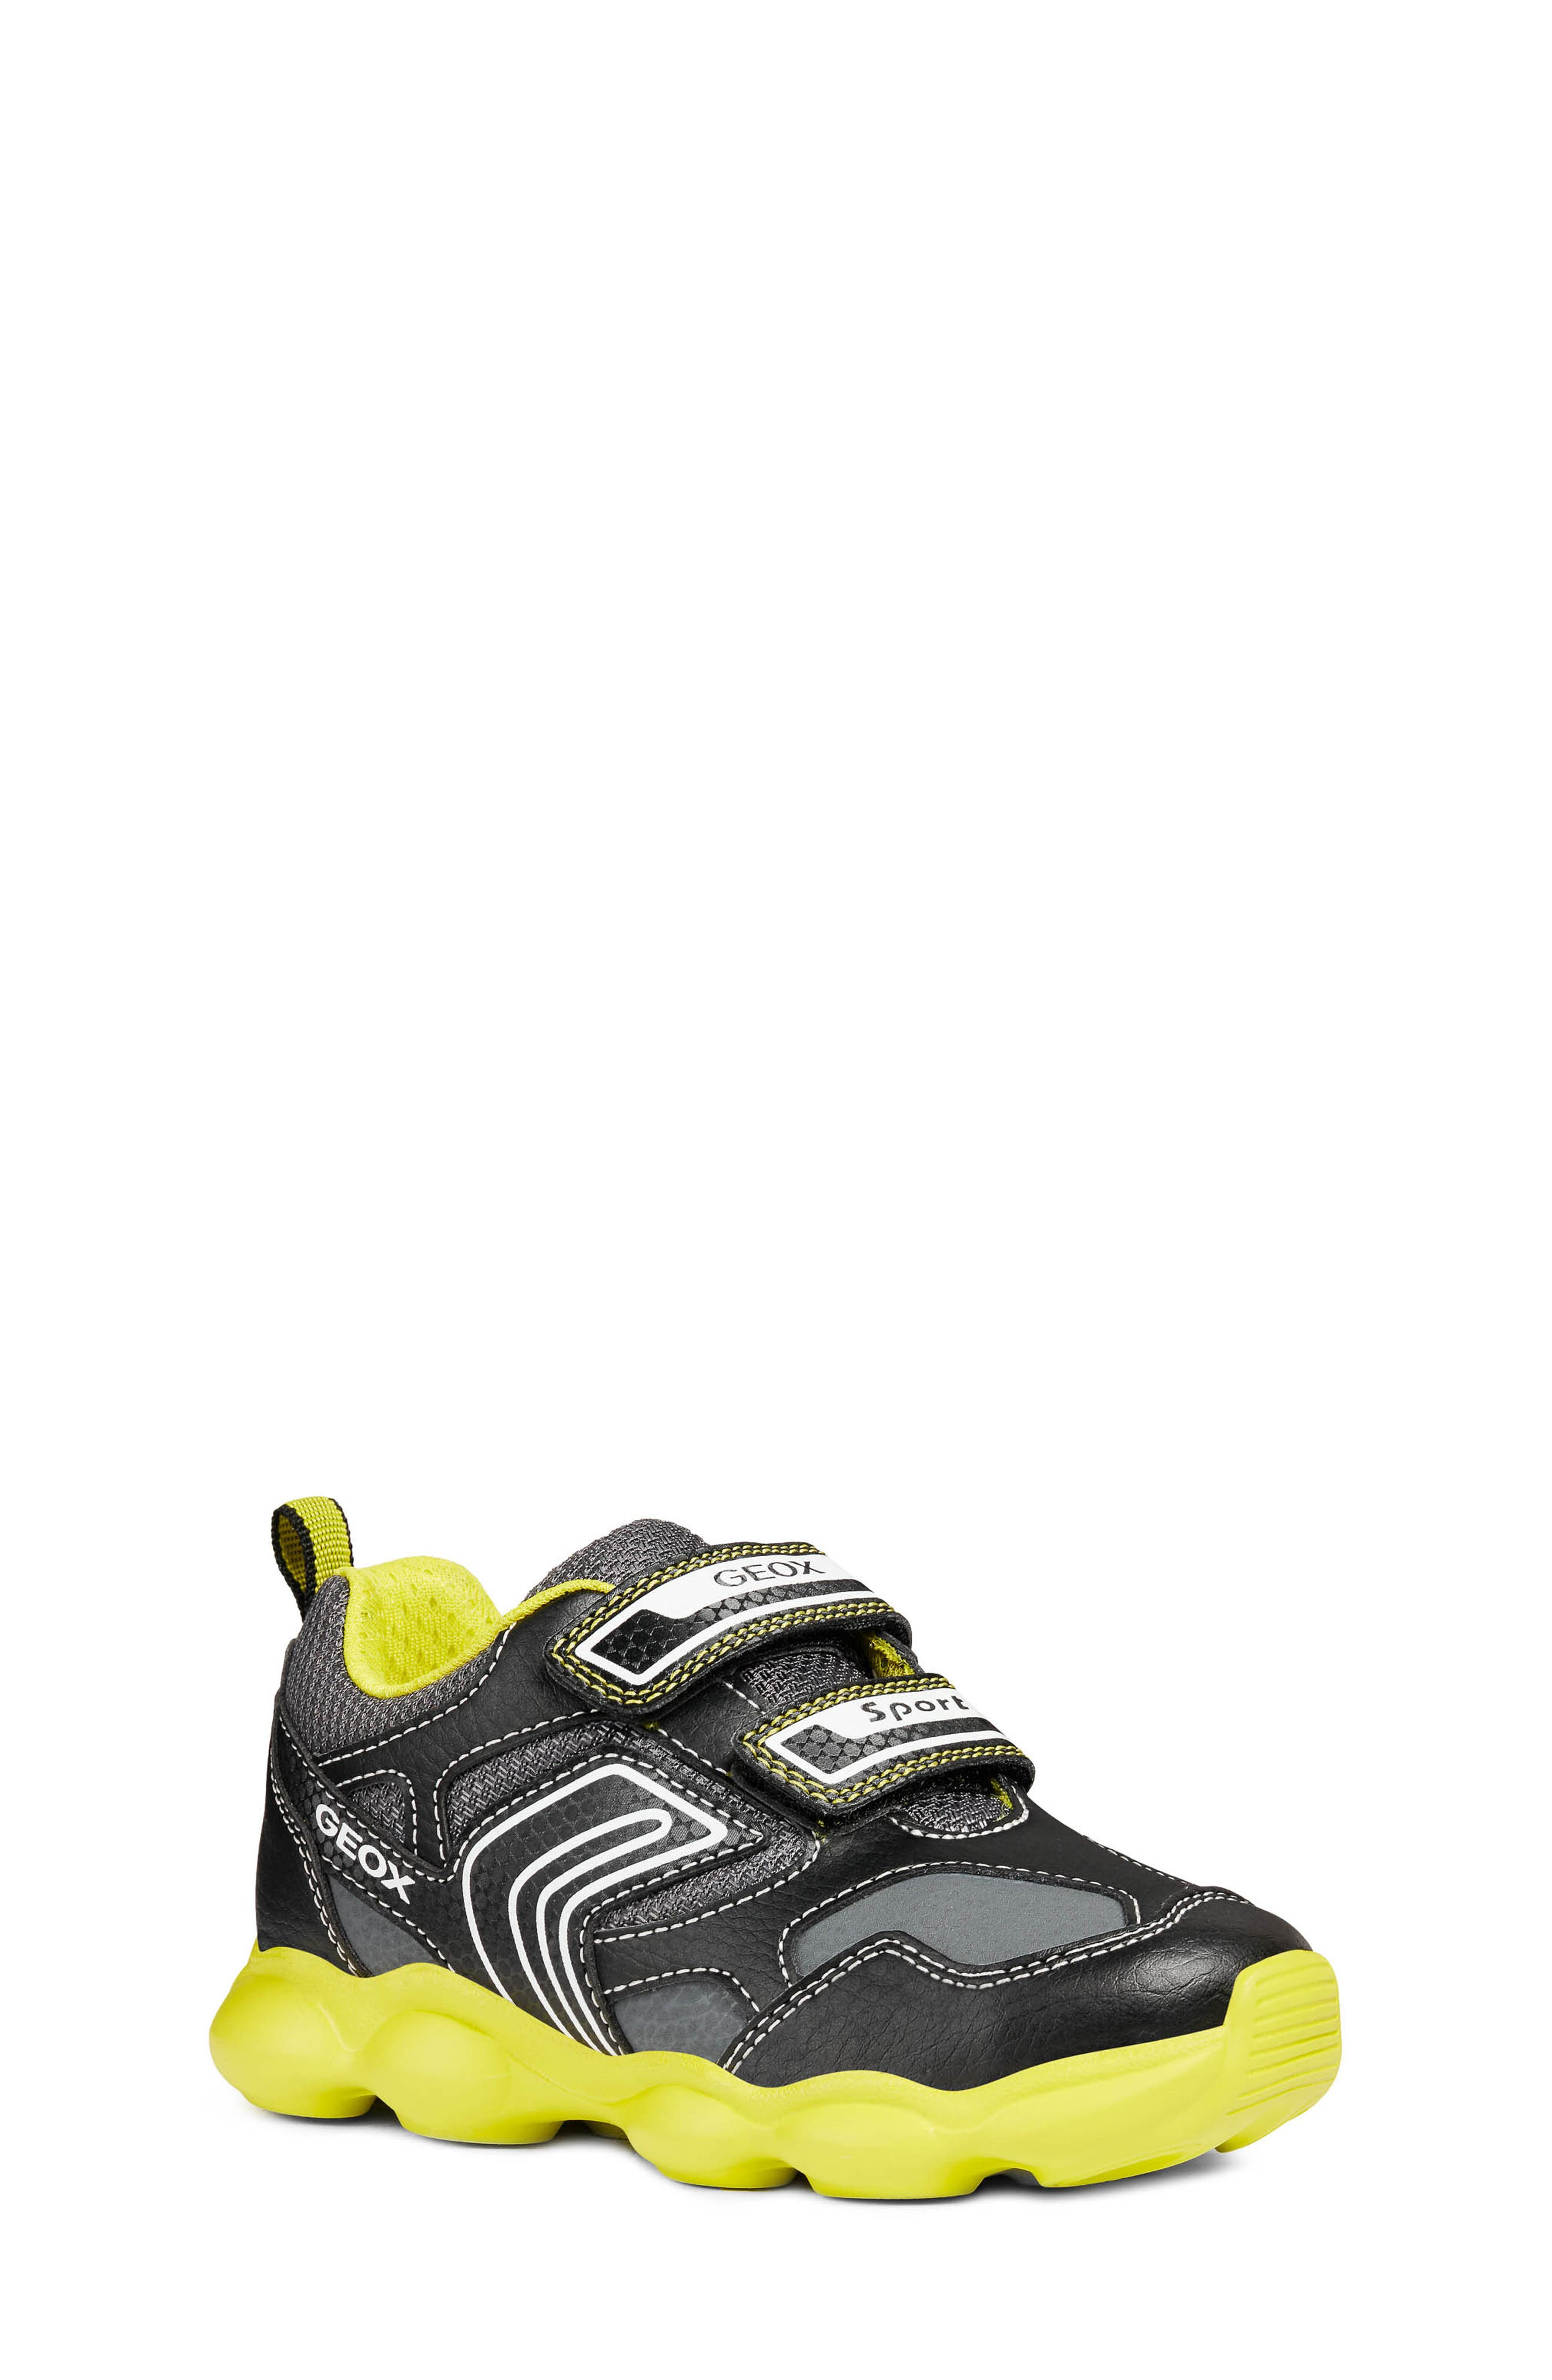 GEOX, Munfrey Waterproof Sneaker, Main thumbnail 1, color, BLACK/ LIME